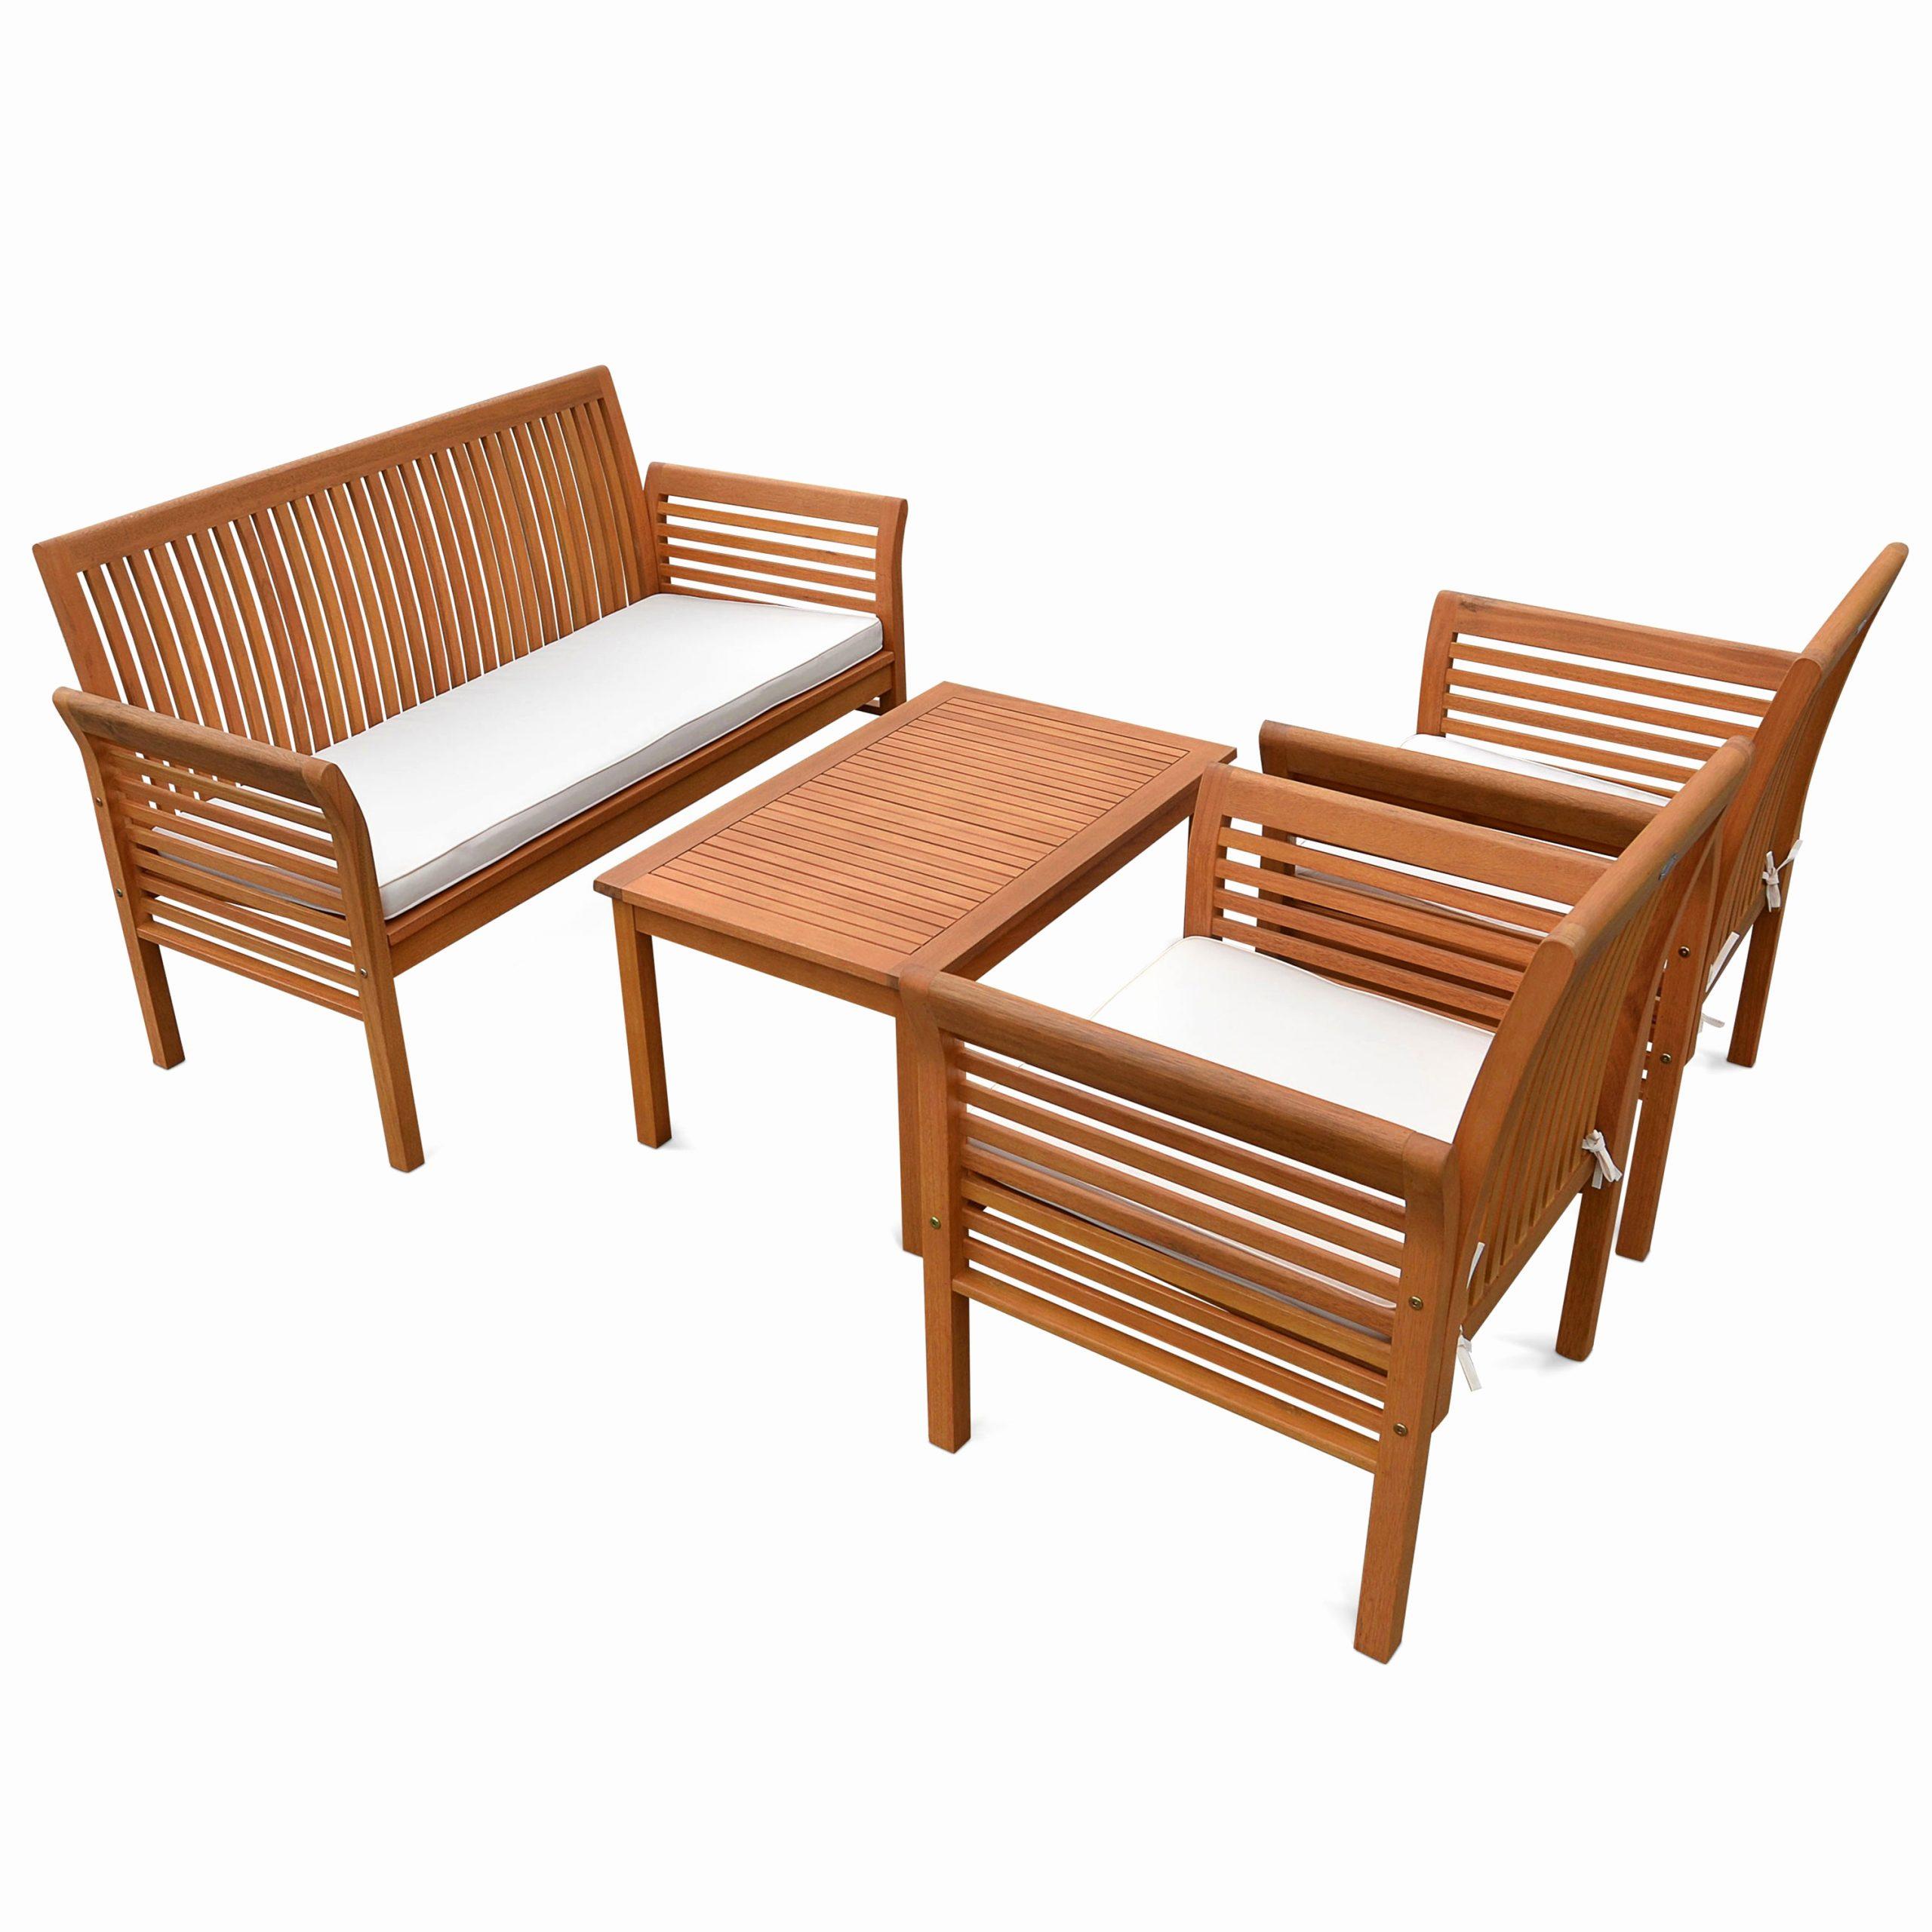 Pied De Table Reglable Mr Bricolage Source D'inspiration ... destiné Salon De Jardin Mr Bricolage